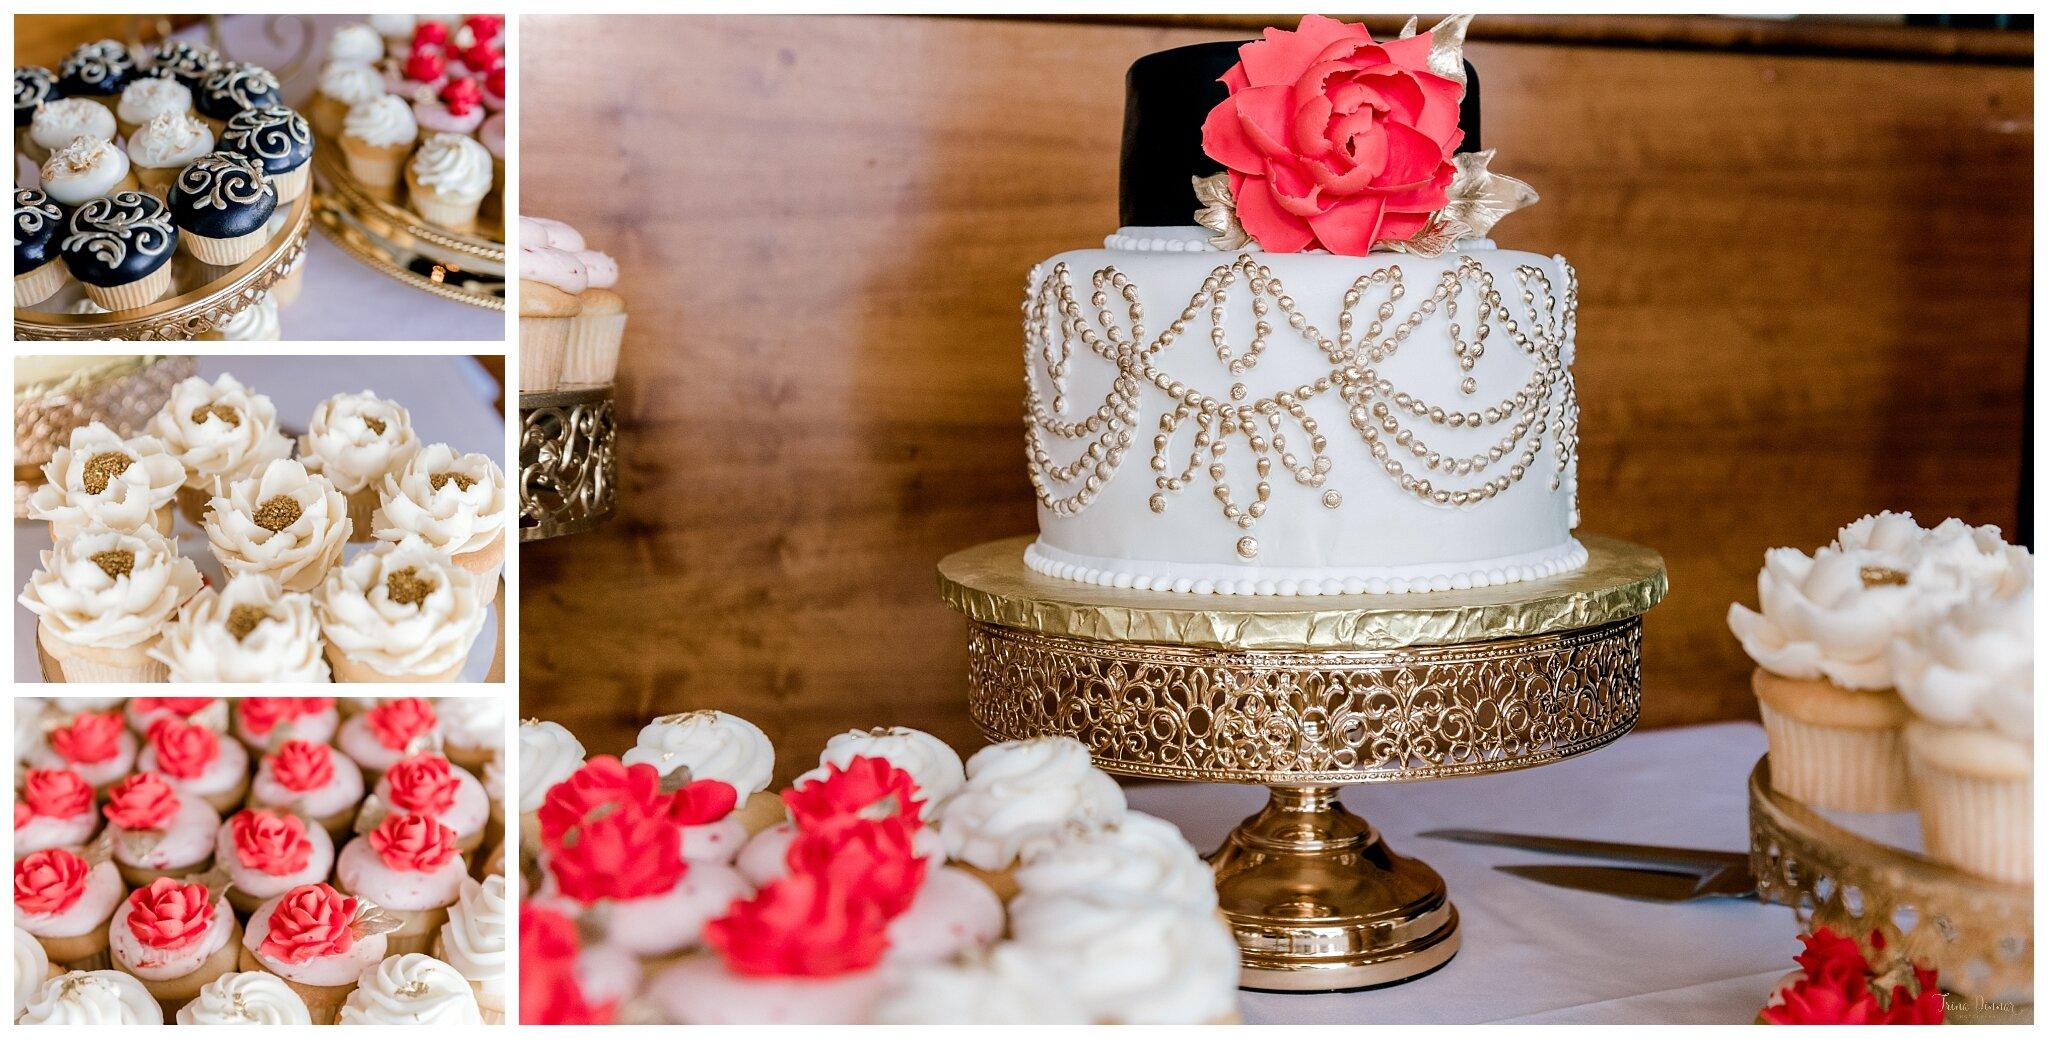 Let Them Eat Cake Kennebunk Maine Wedding Desserts